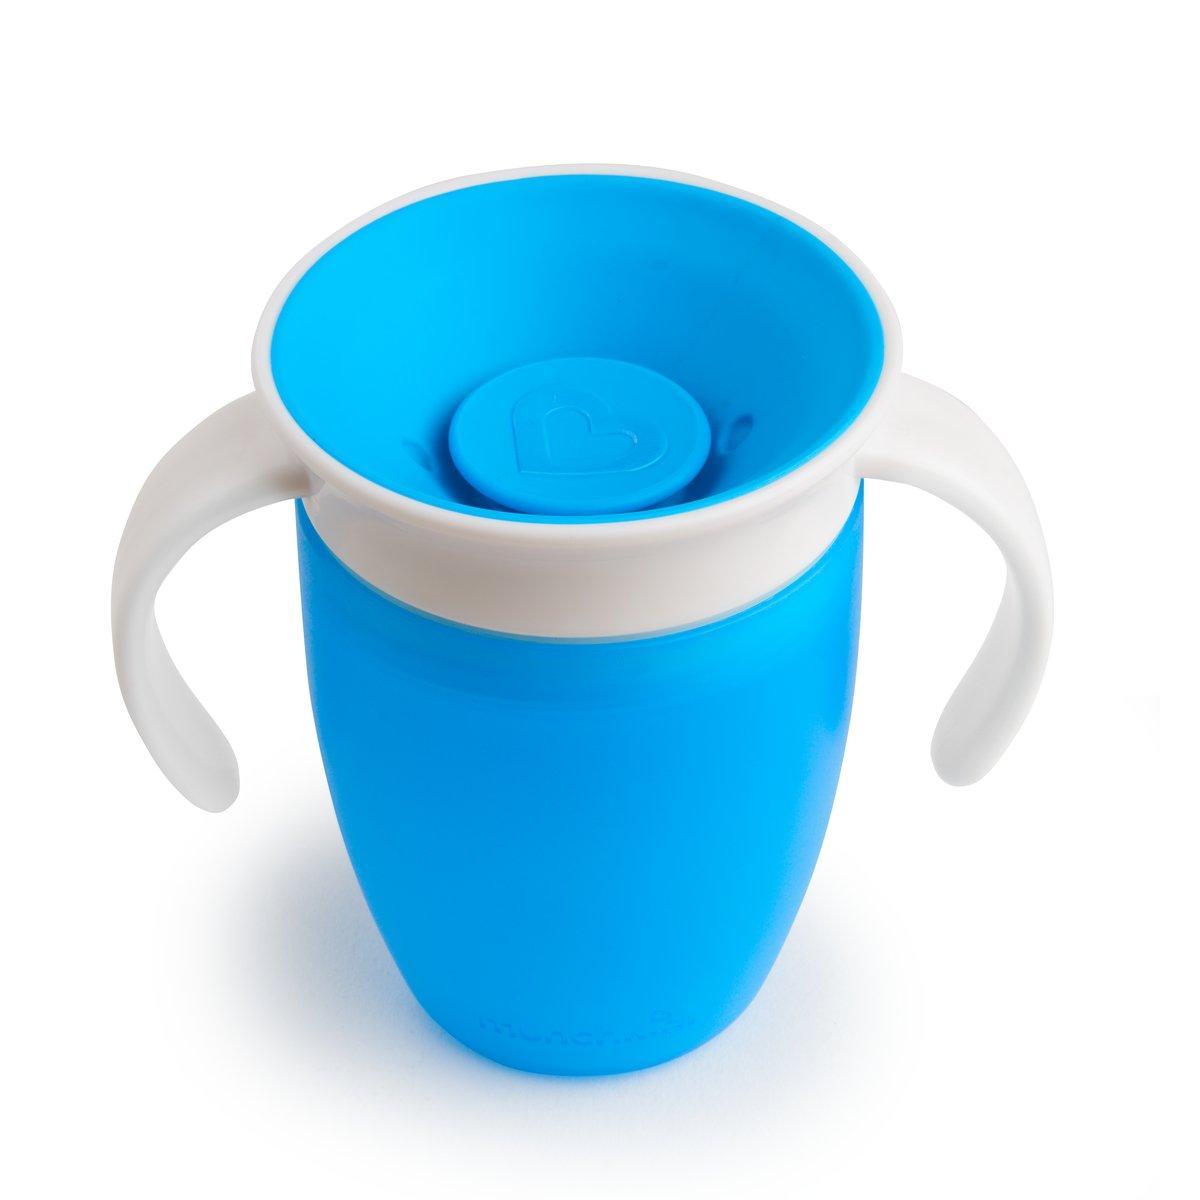 Чашка непроливная Munchkin Miracle 360 с ручками, 207 мл